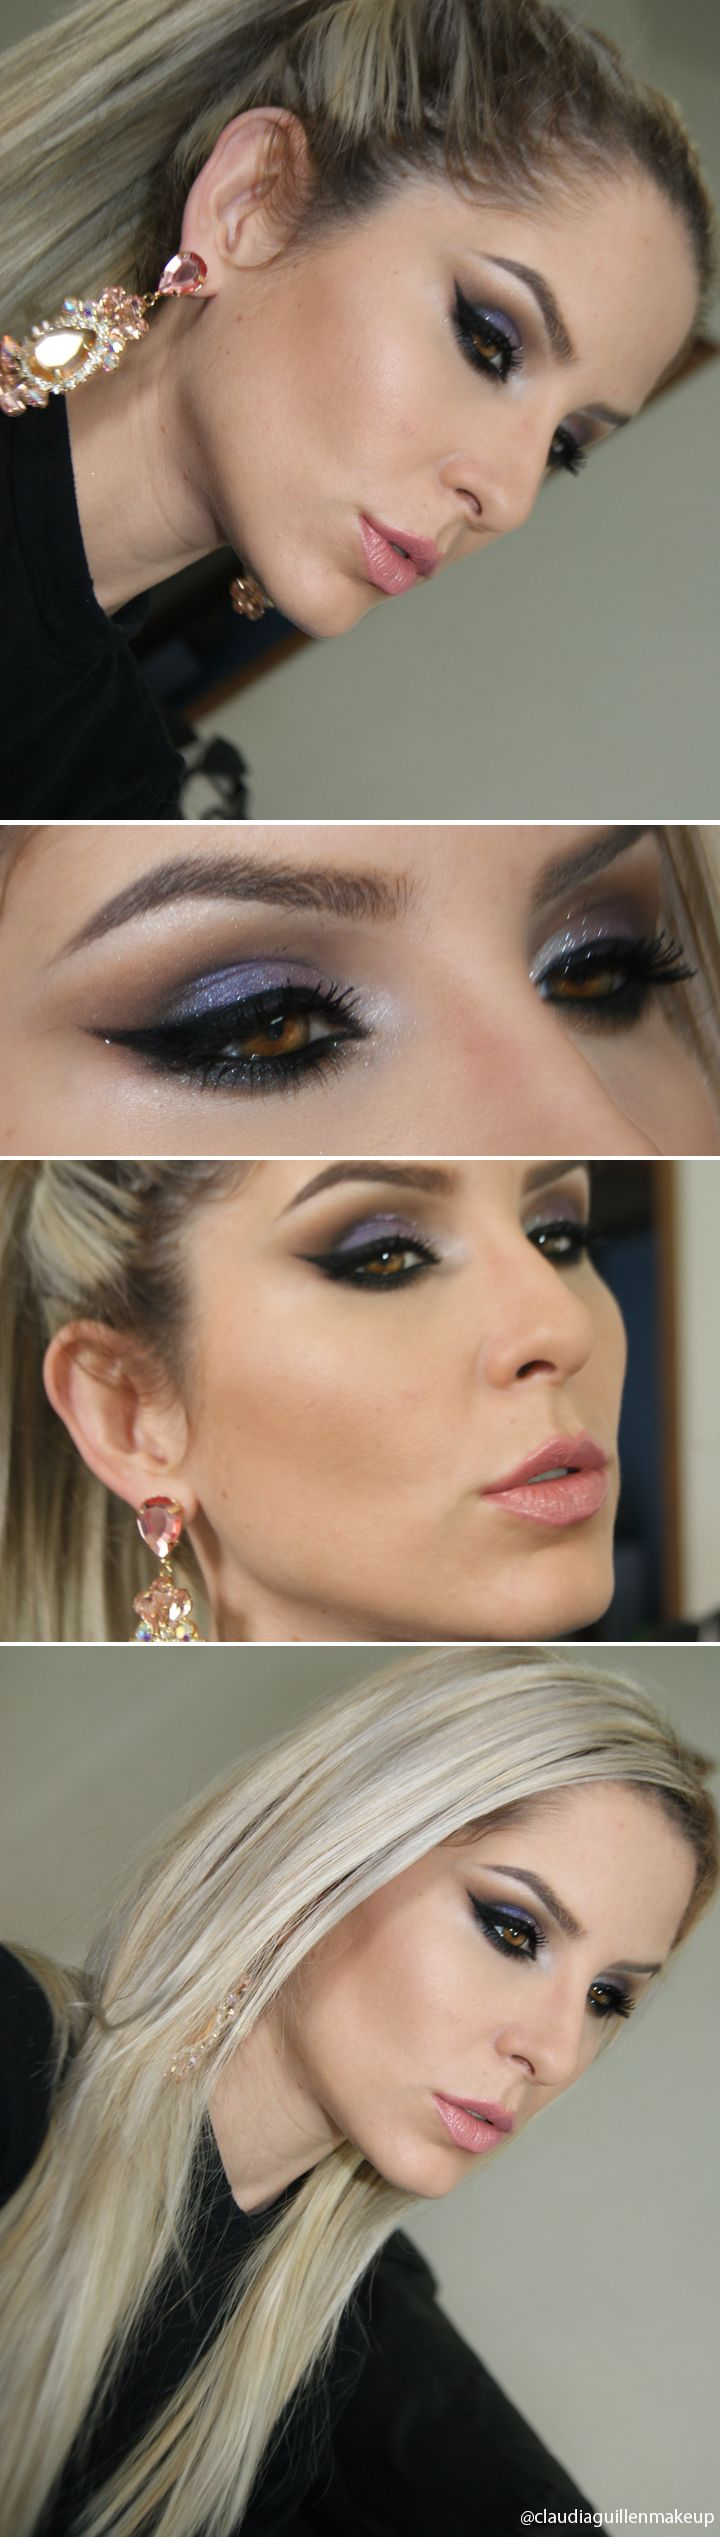 make com pigmento Bewitched makeup geek e gitter toque de cristal pausa para feminices http://instagram.com/claudiaguillenmakeup http://claudiaguillen.inbloodesign.com/